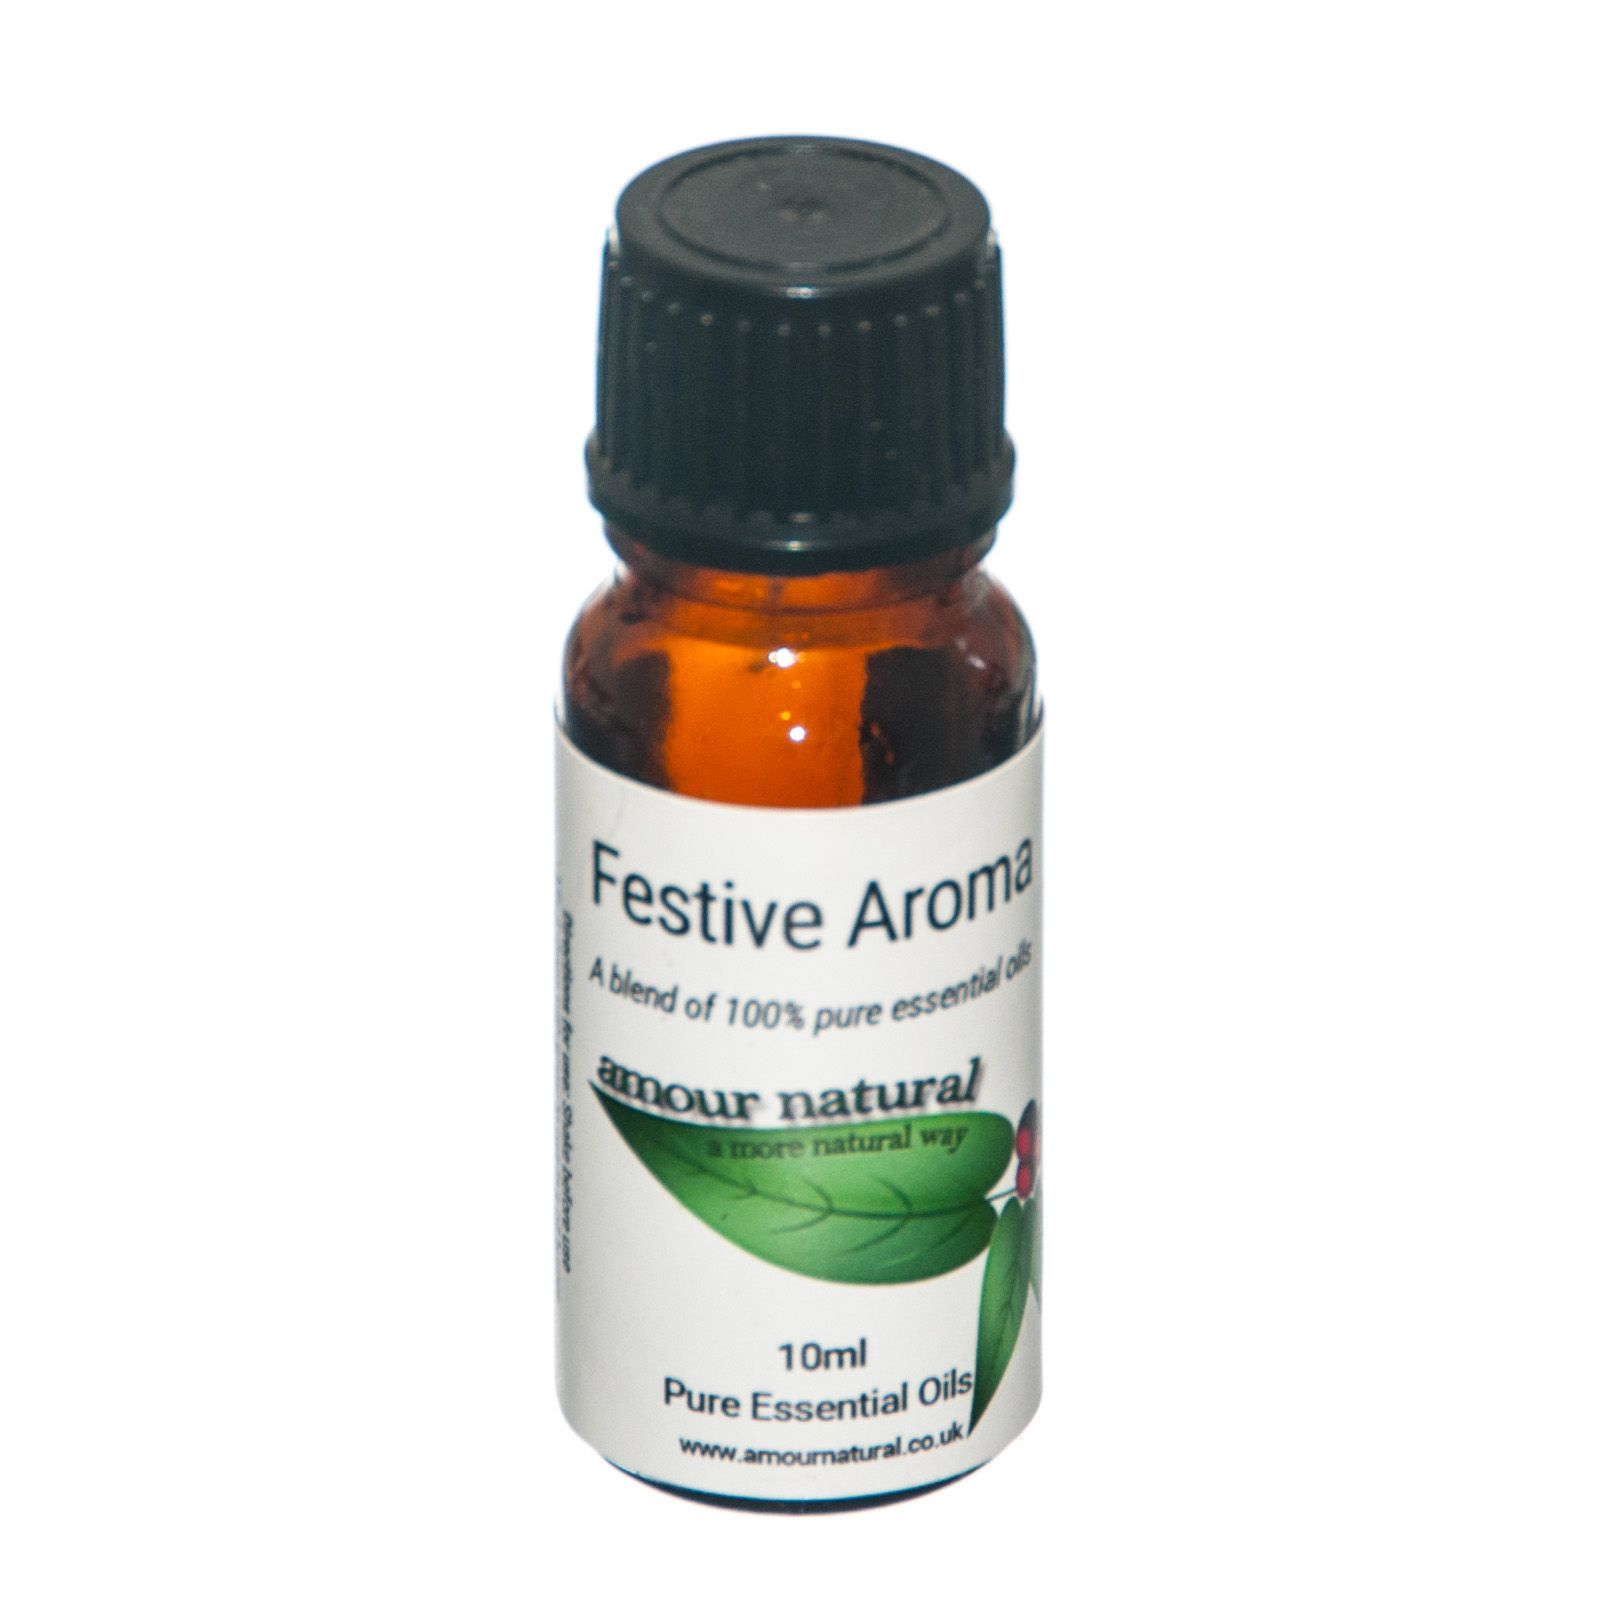 Festive Aroma Essential Oil Blend 10ml